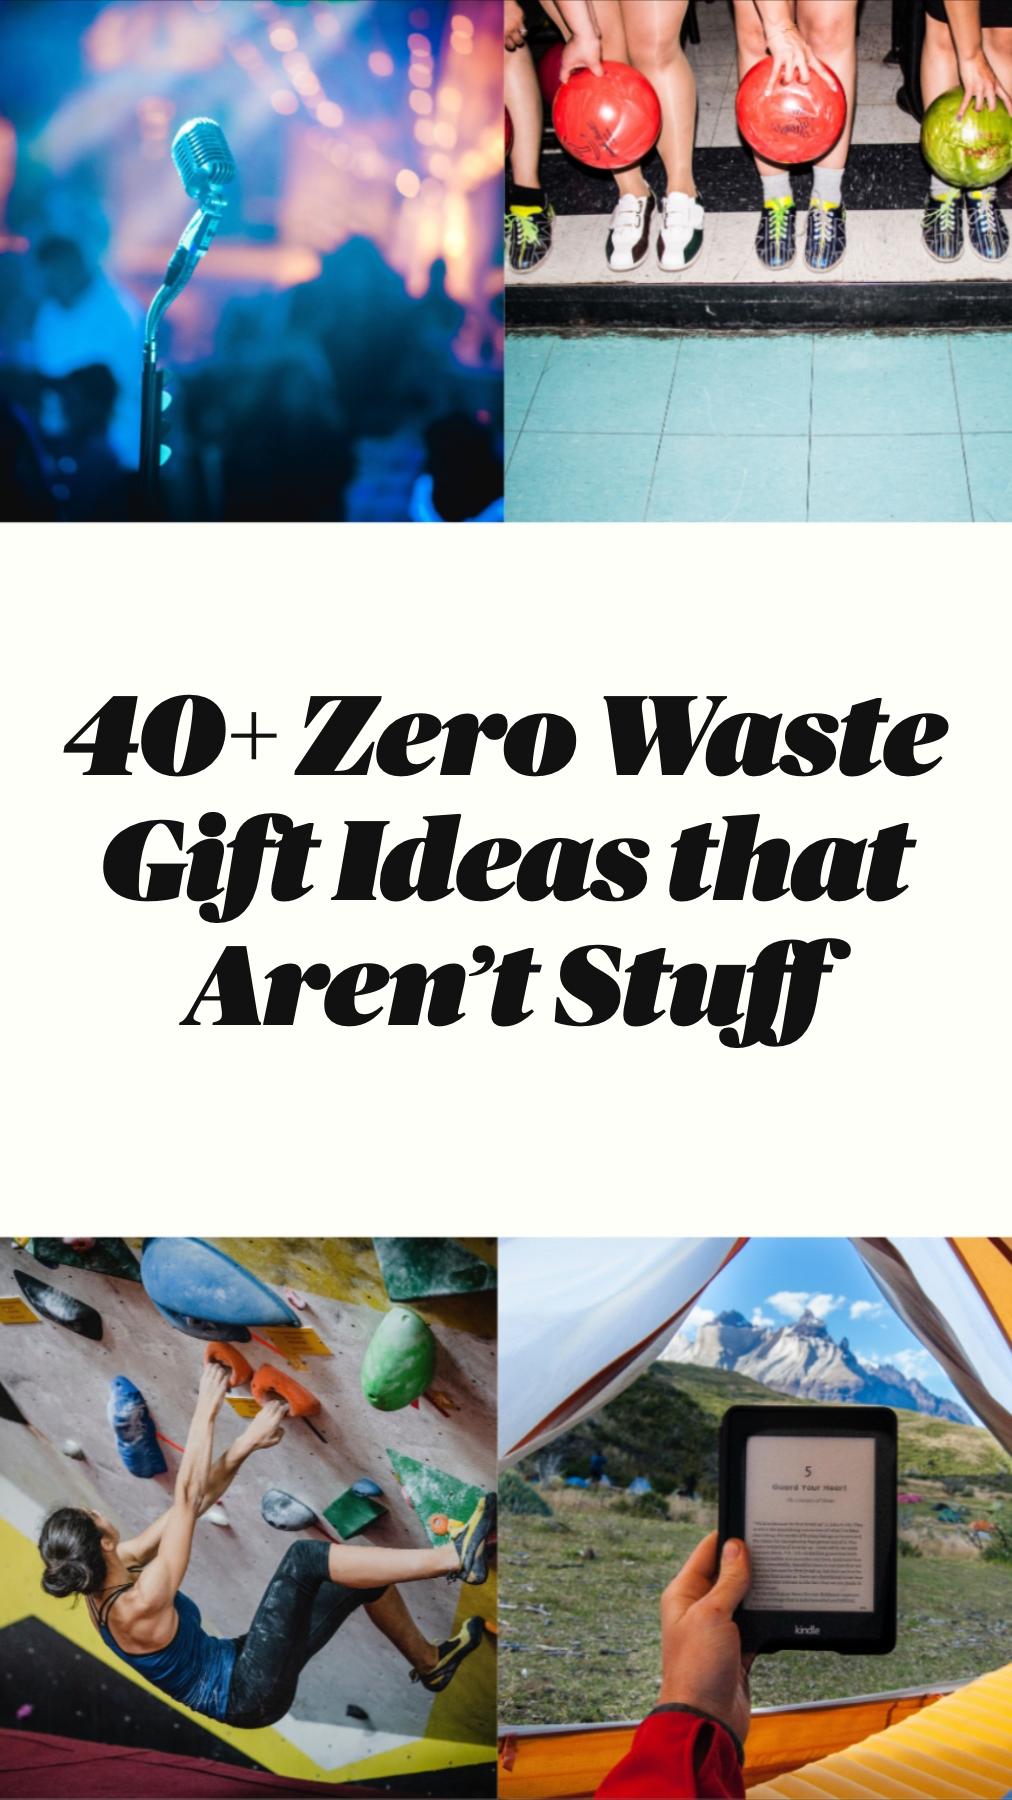 40+ Zero Waste Gift Ideas that Aren't Stuff